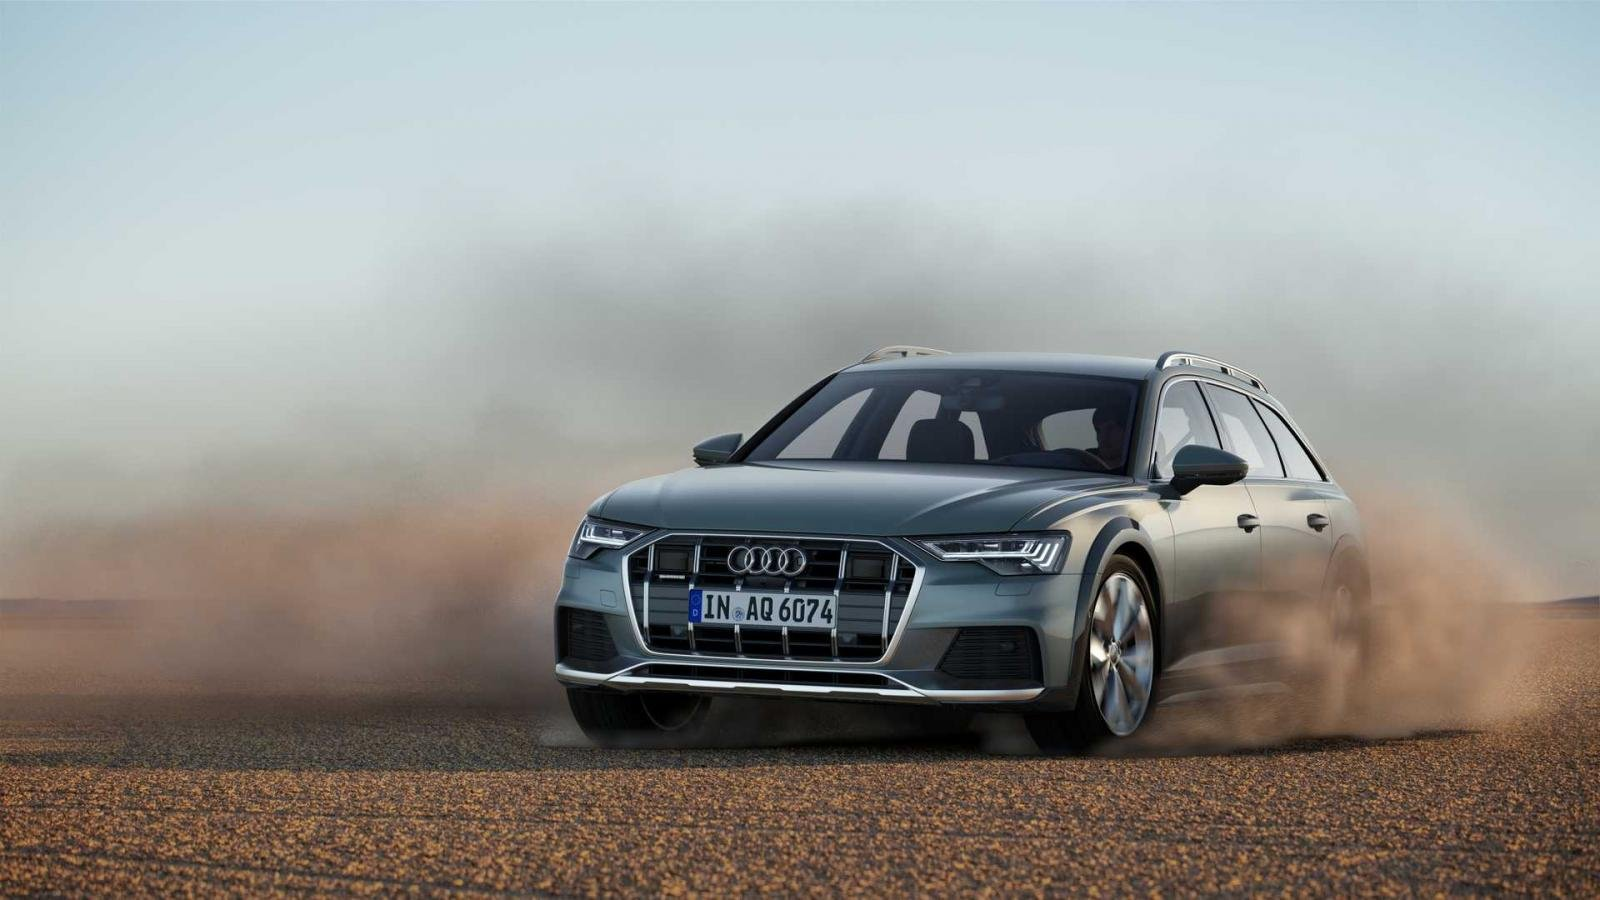 Audi A6 Allroad 2020 sẽ ra mắt mùa hè năm 2020.